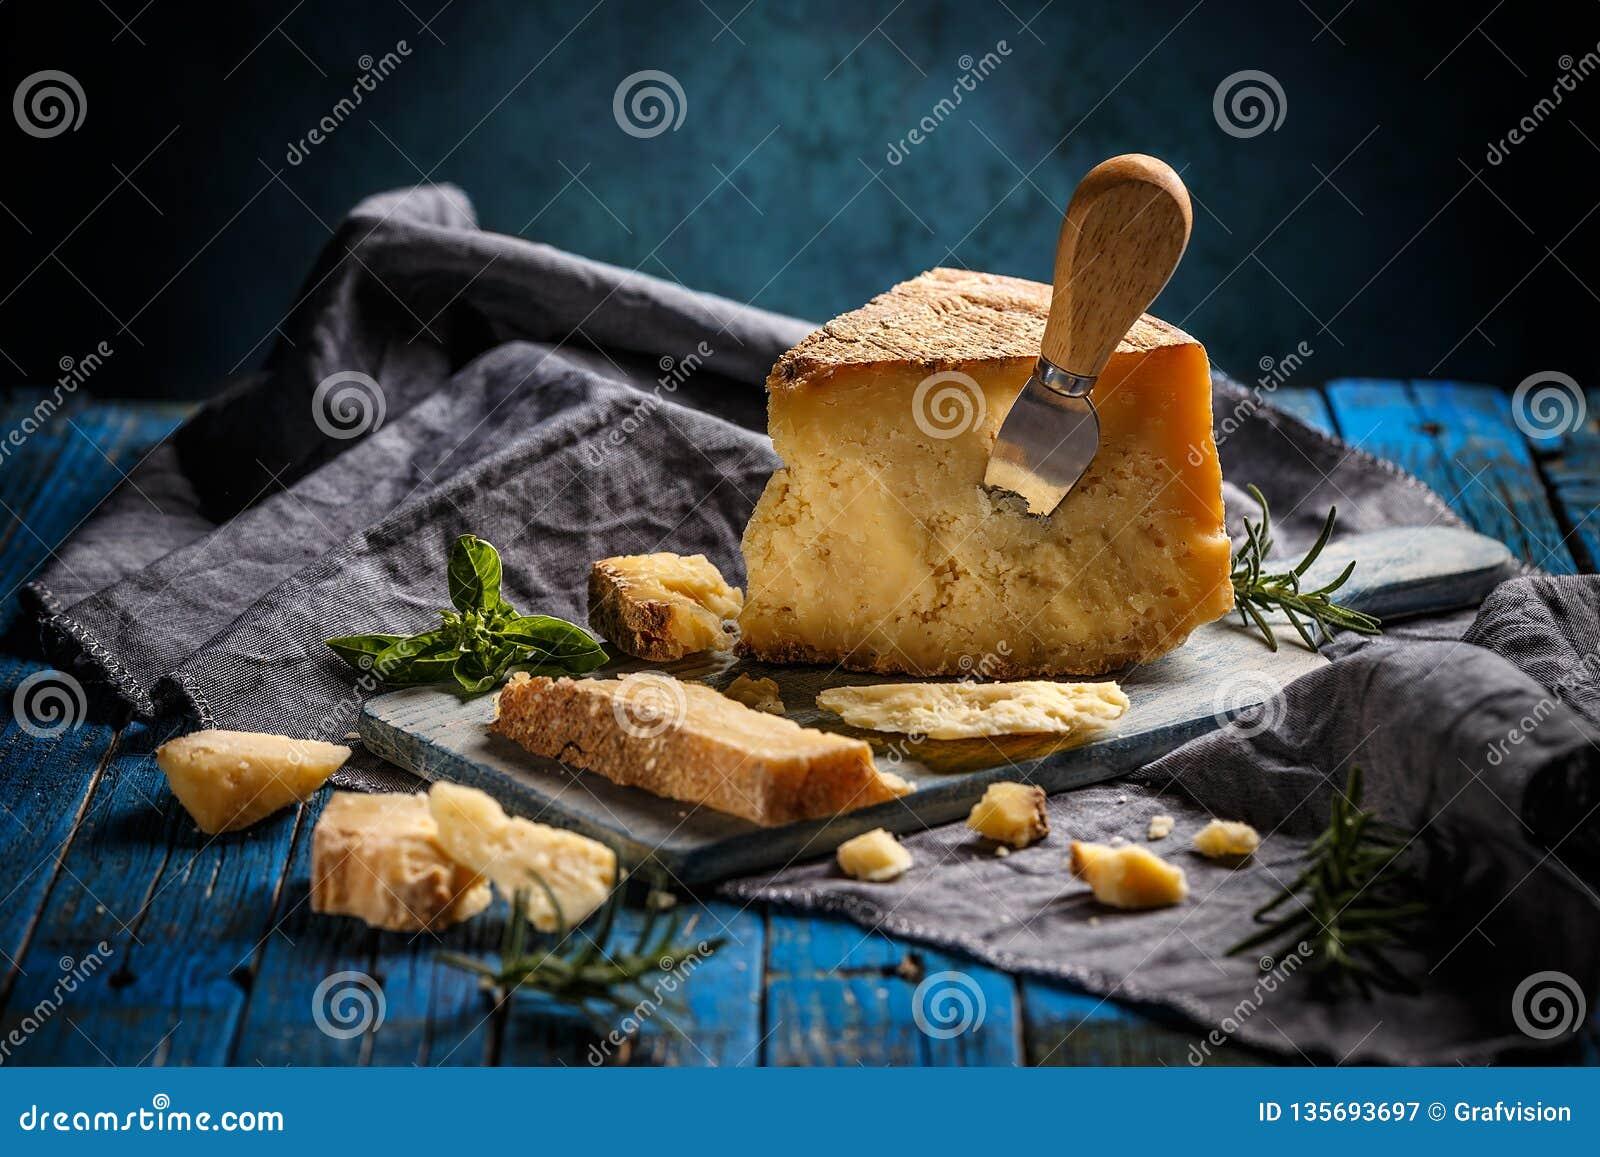 Сыр пармезан, натюрморт